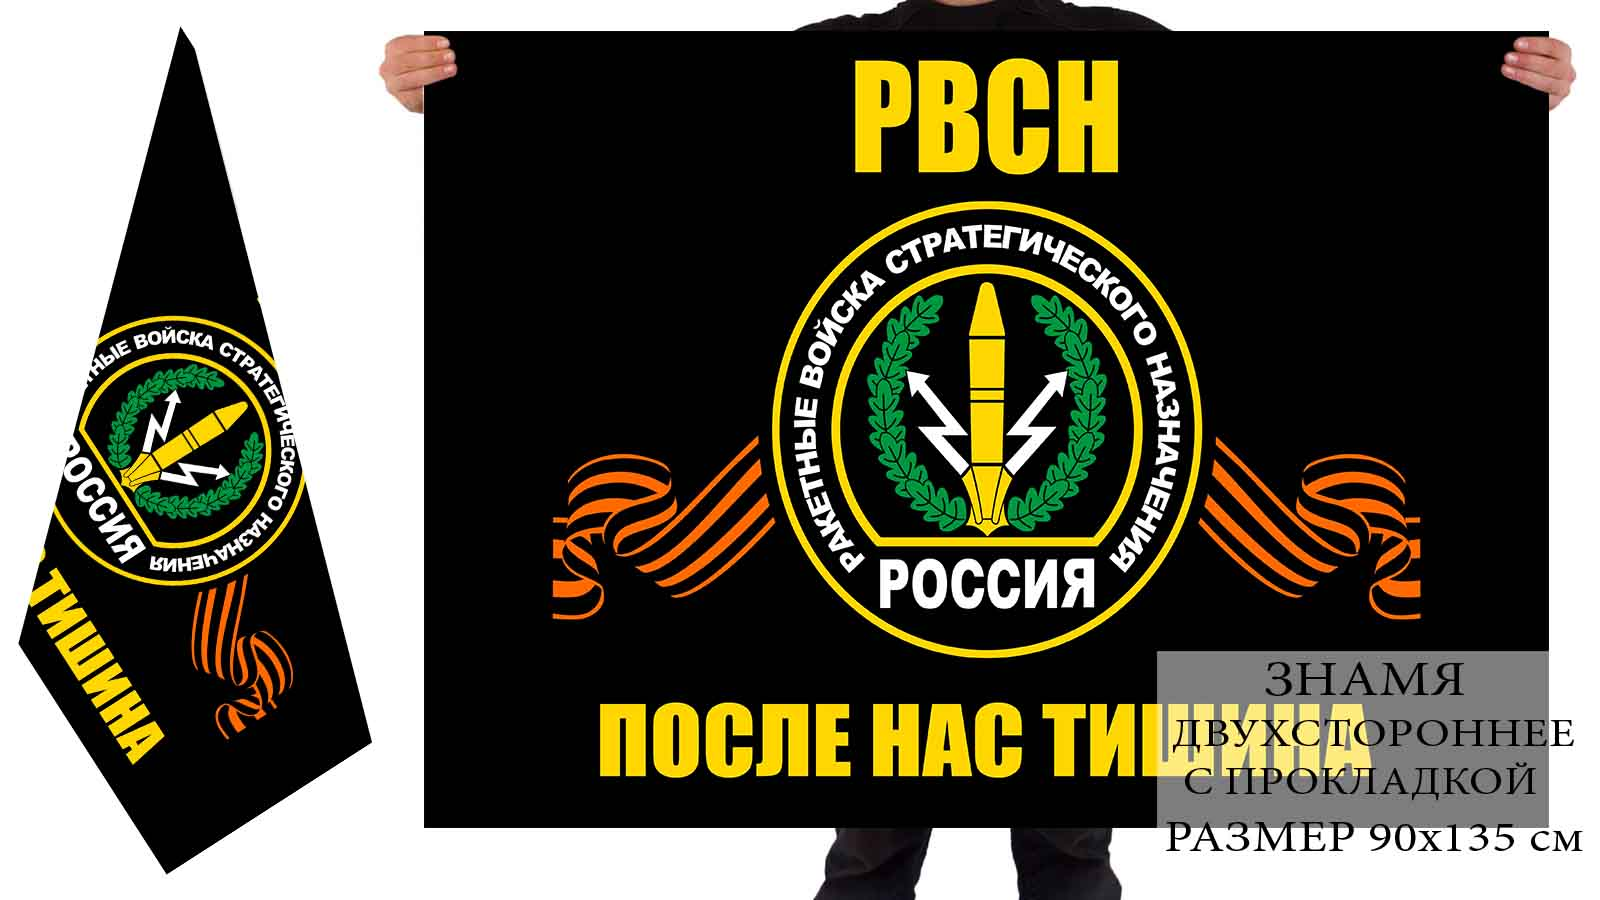 Двусторонний флаг с символикой РВСН